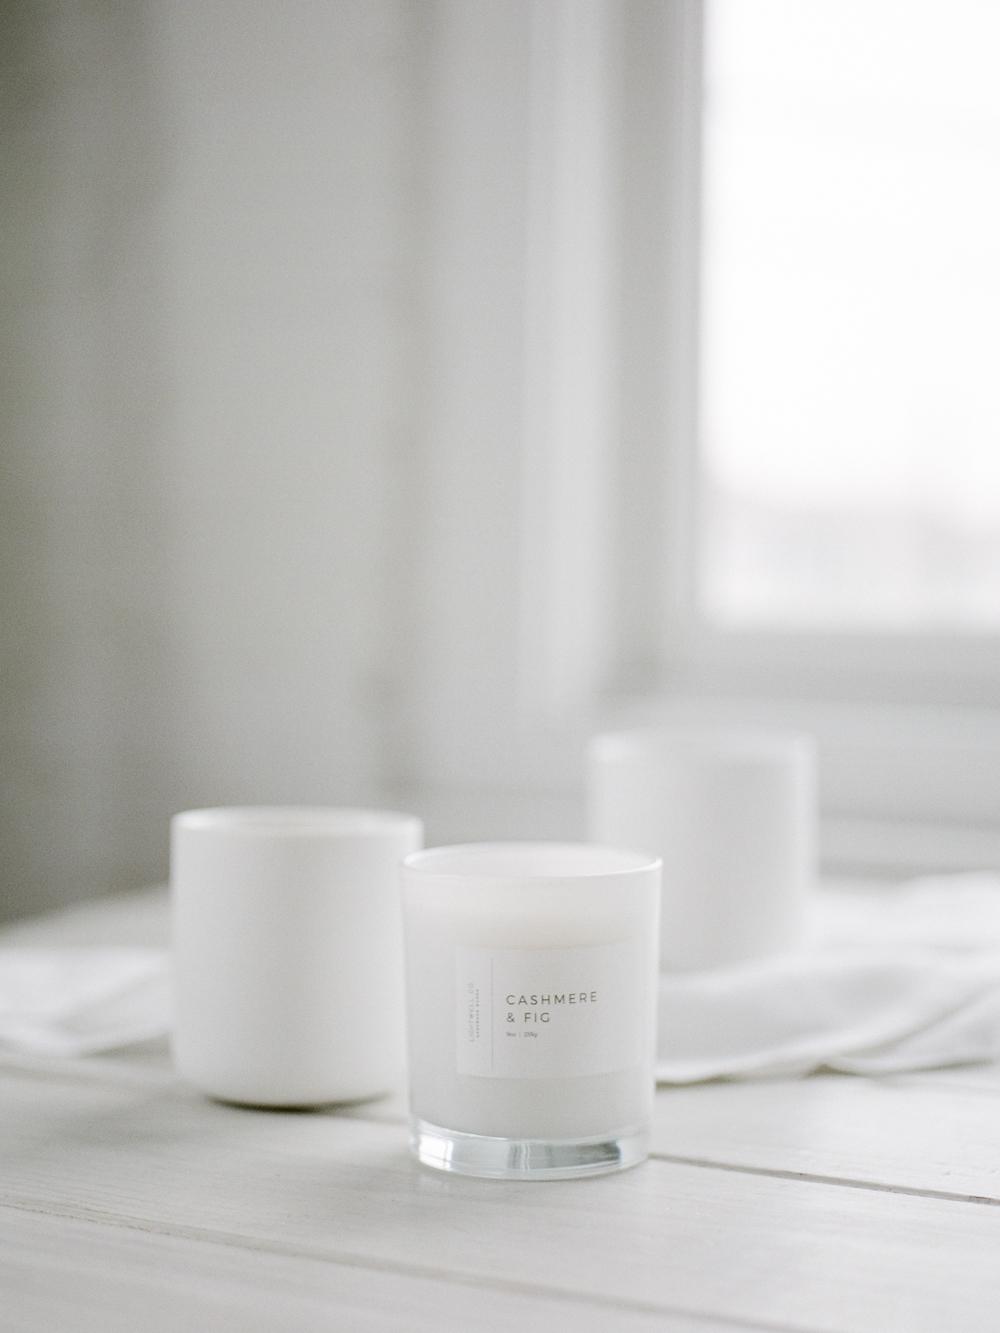 brand photographer Christine Gosch - lightwell co - handmade candles in houston Texas-10.jpg